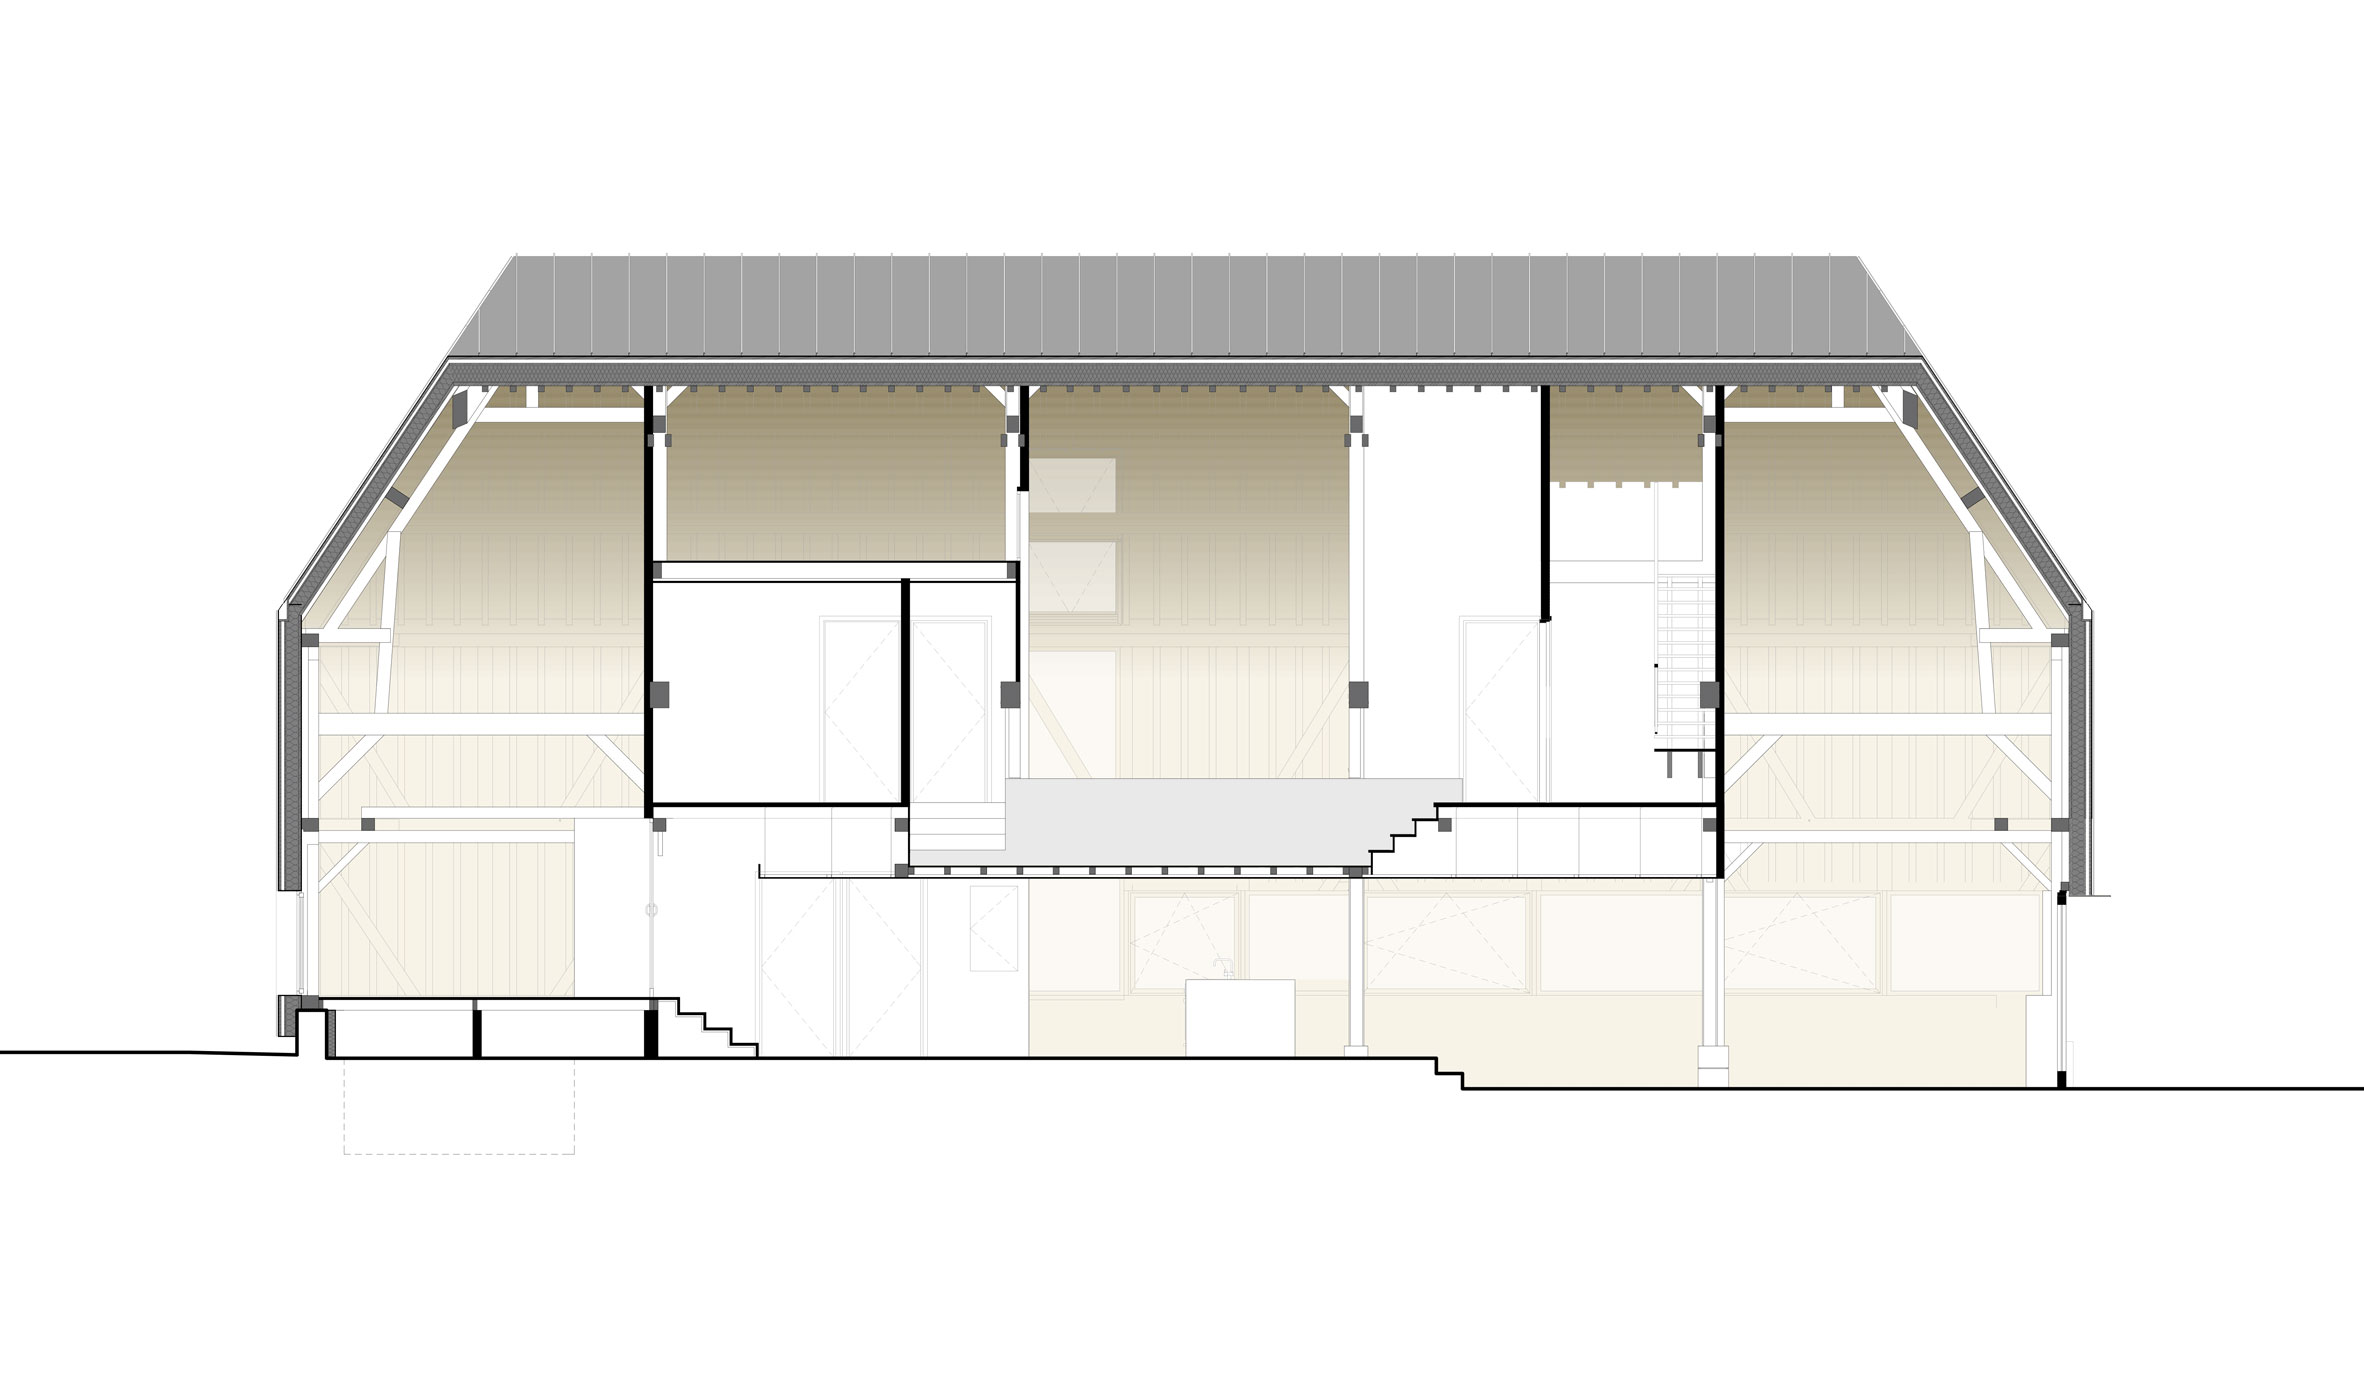 Antonin-Ziegler-covers-abandoned-barn-in-zinc-plates-15